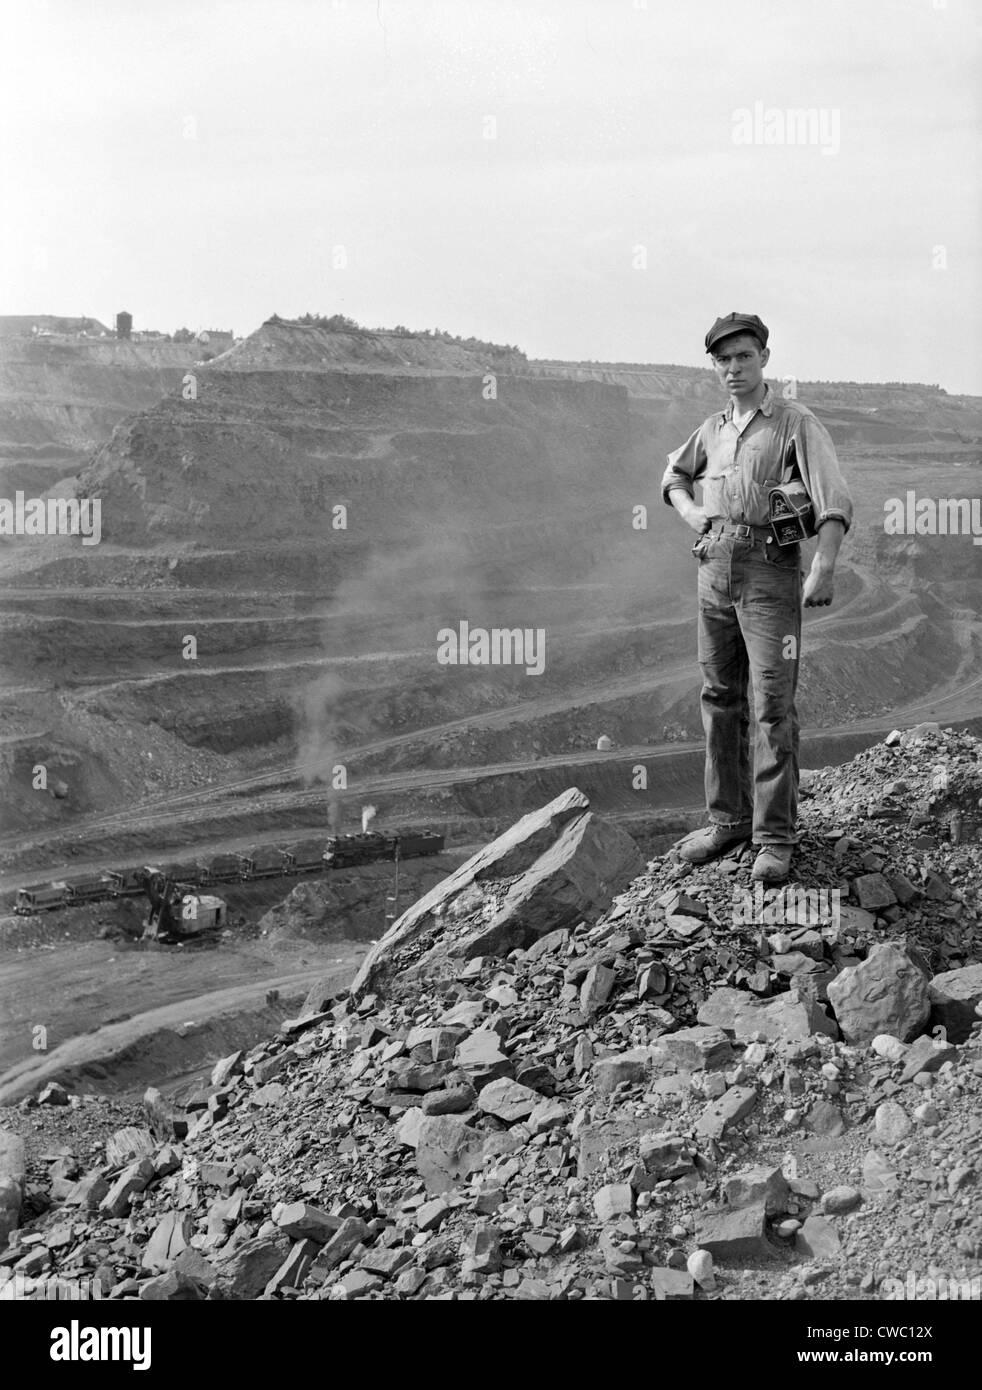 Miner John Palumbo, Jr. (1921-2008), poses on the edge of the Hull-Rust-Mahoning iron pit mine in Minnesota's - Stock Image